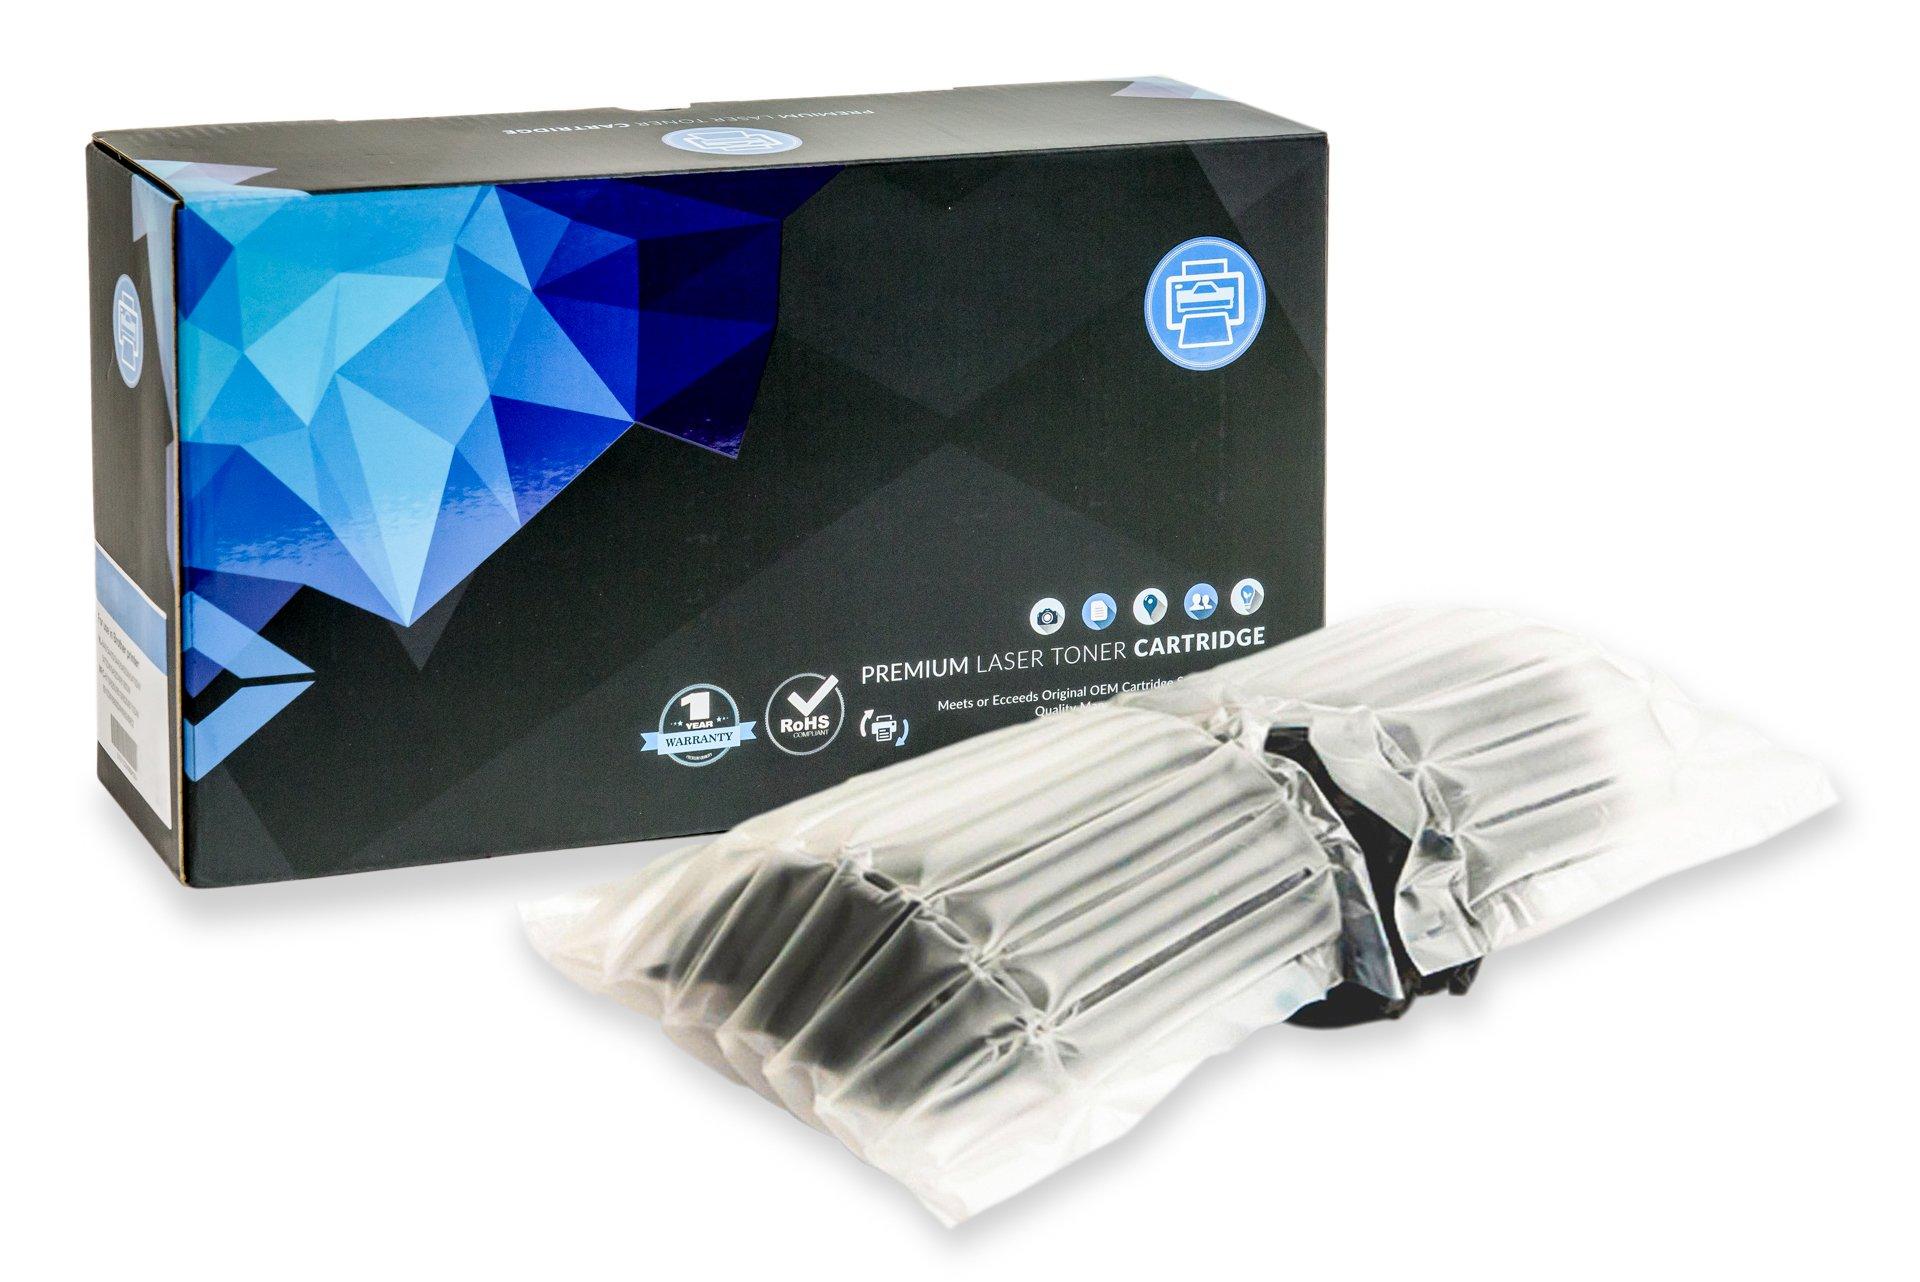 Premium New Black Toner Cartridge for Okidata 45807105